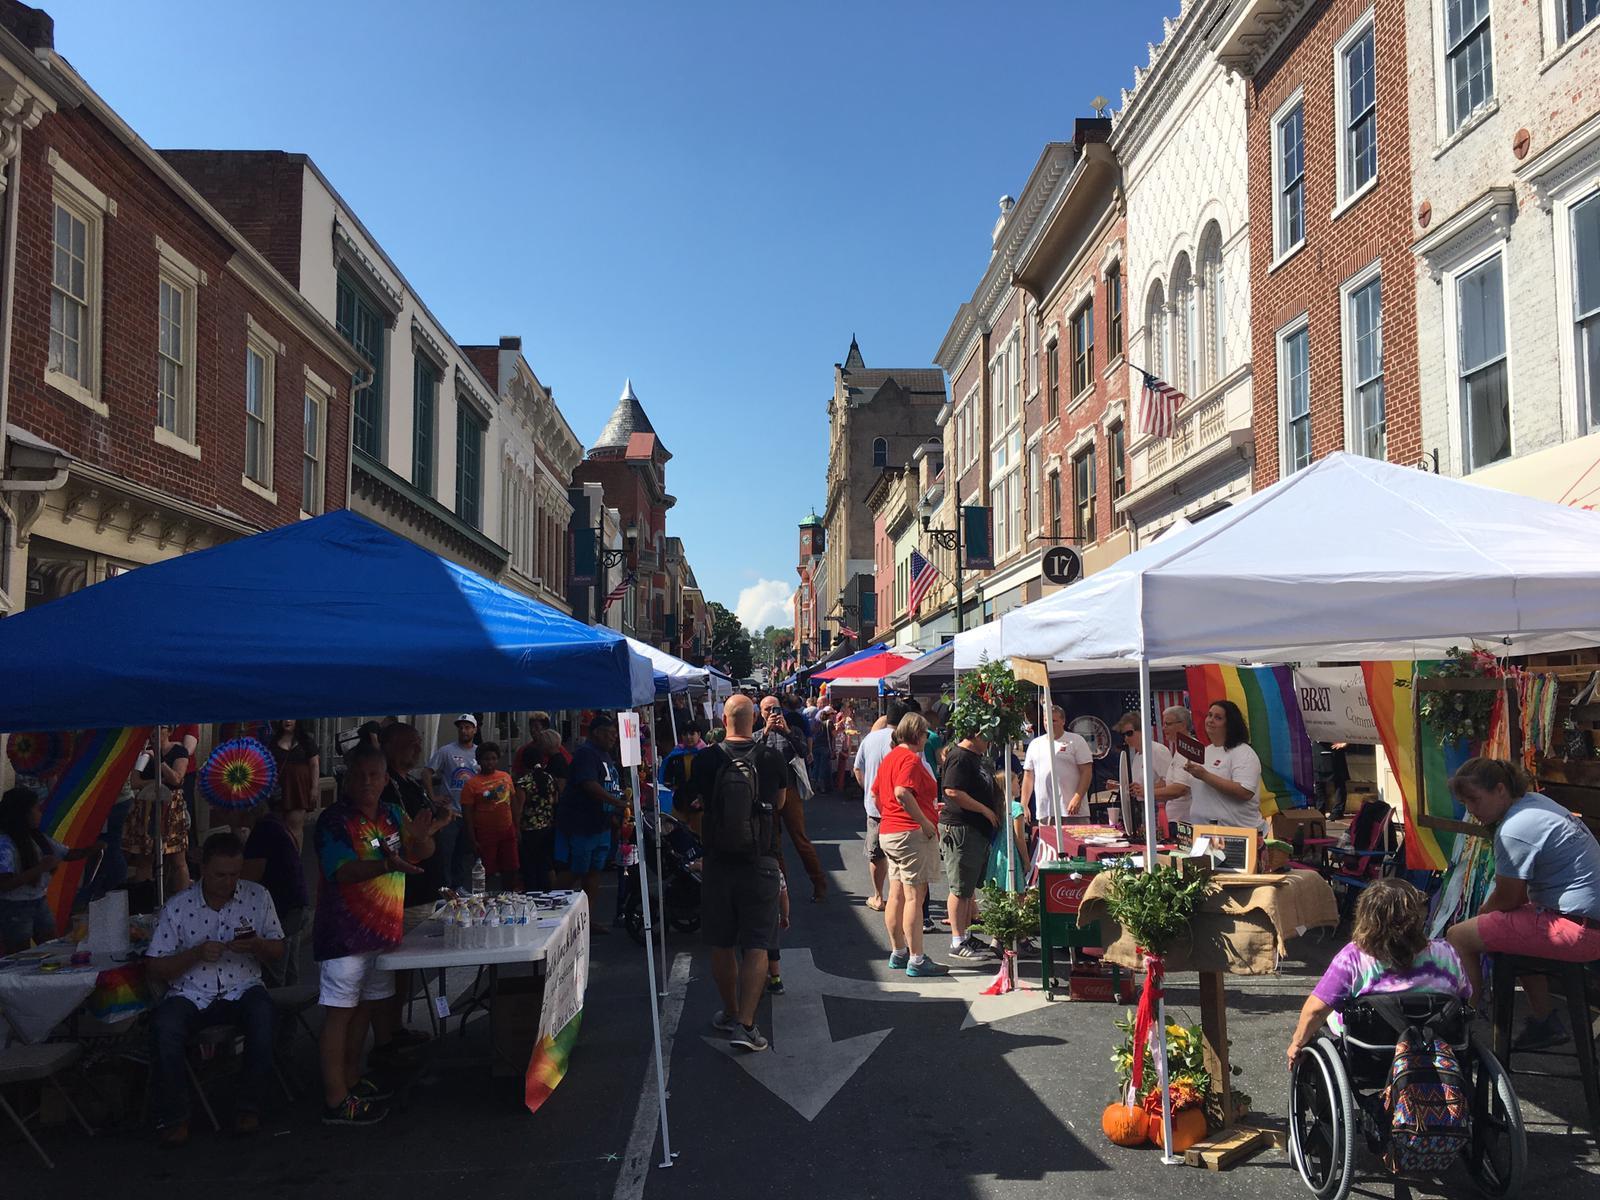 Staunton Pride 2018 - Beverley Street, Staunton, VA